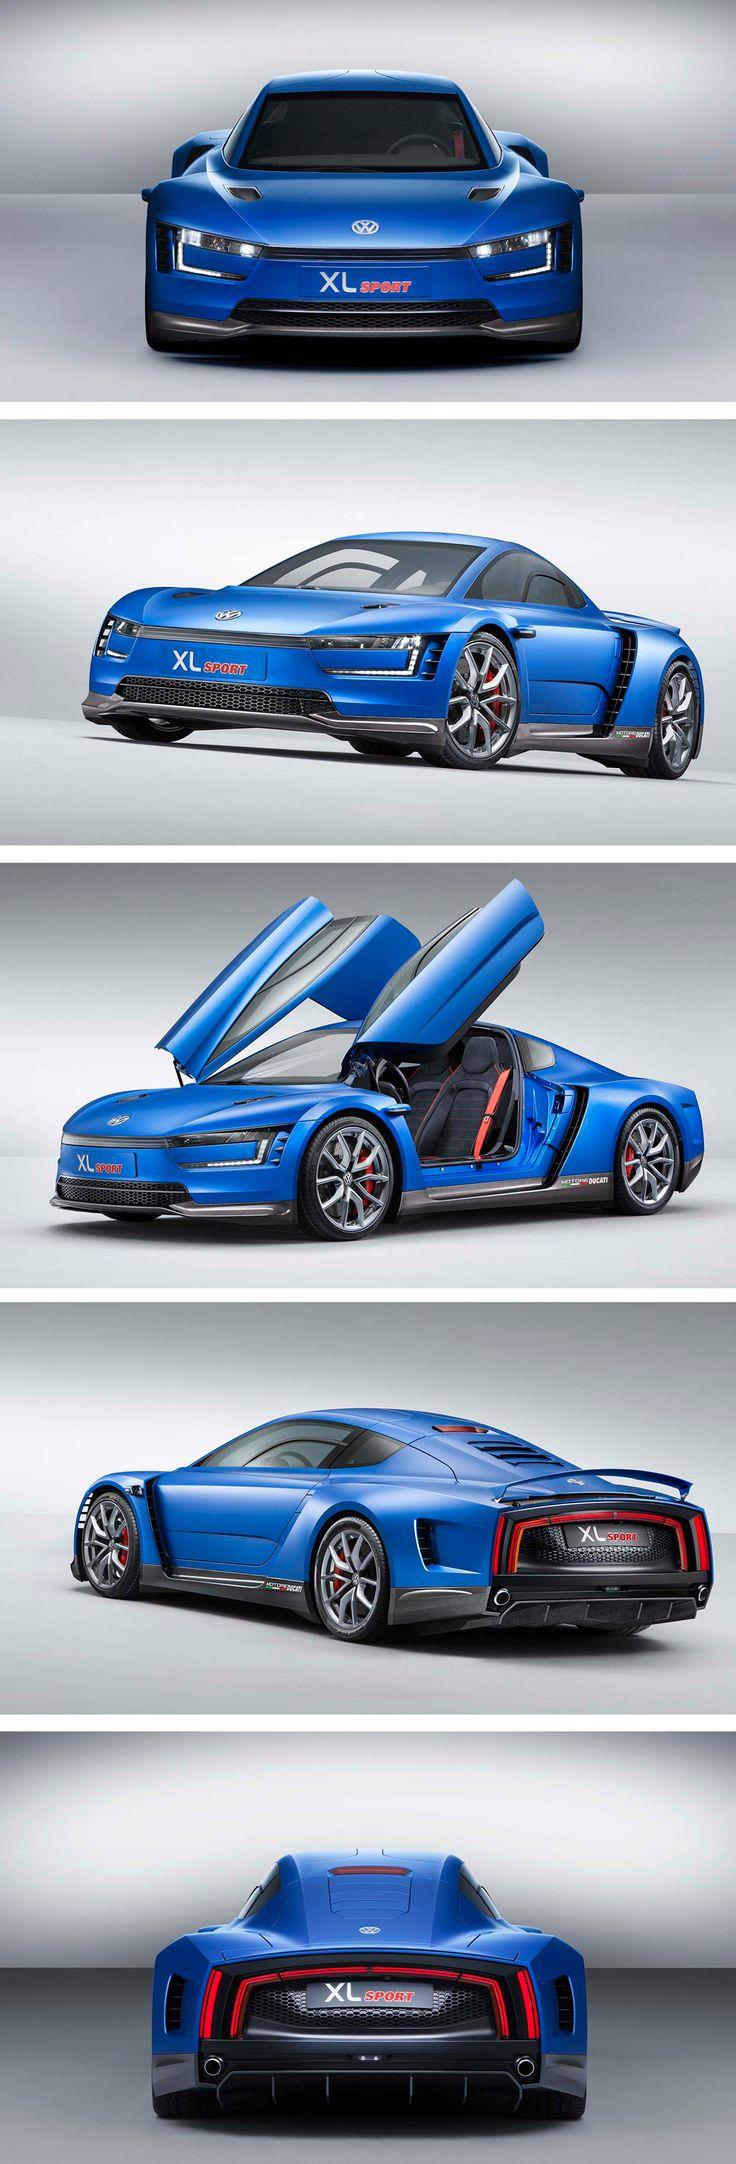 VW XL SPORT mit Ducati Motor https://www.amazon.co.uk/Baby-Car-Mirror-Shatterproof-Installation/dp/B06XHG6SSY